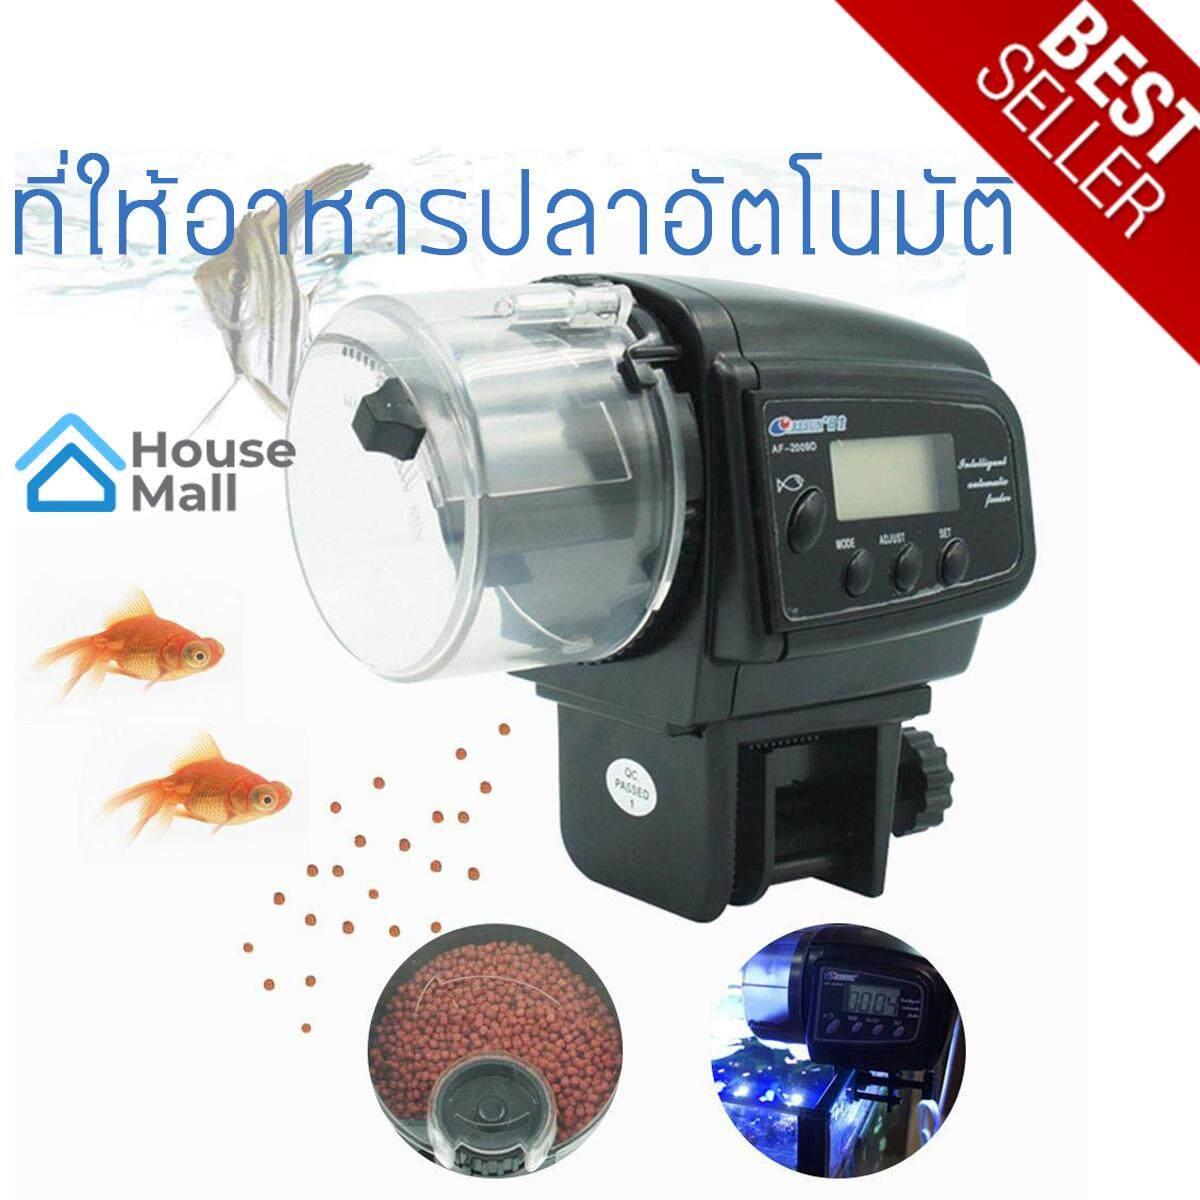 Digital Automatic Fish Feeder Aquarium Tank (AF-2009D) เครื่องให้อาหารปลา อุปกรณ์เลี้ยงปลา เครื่องให้อาหารอัตโนมัติ เครื่อง ตั้งเวลาให้อาหารปลา